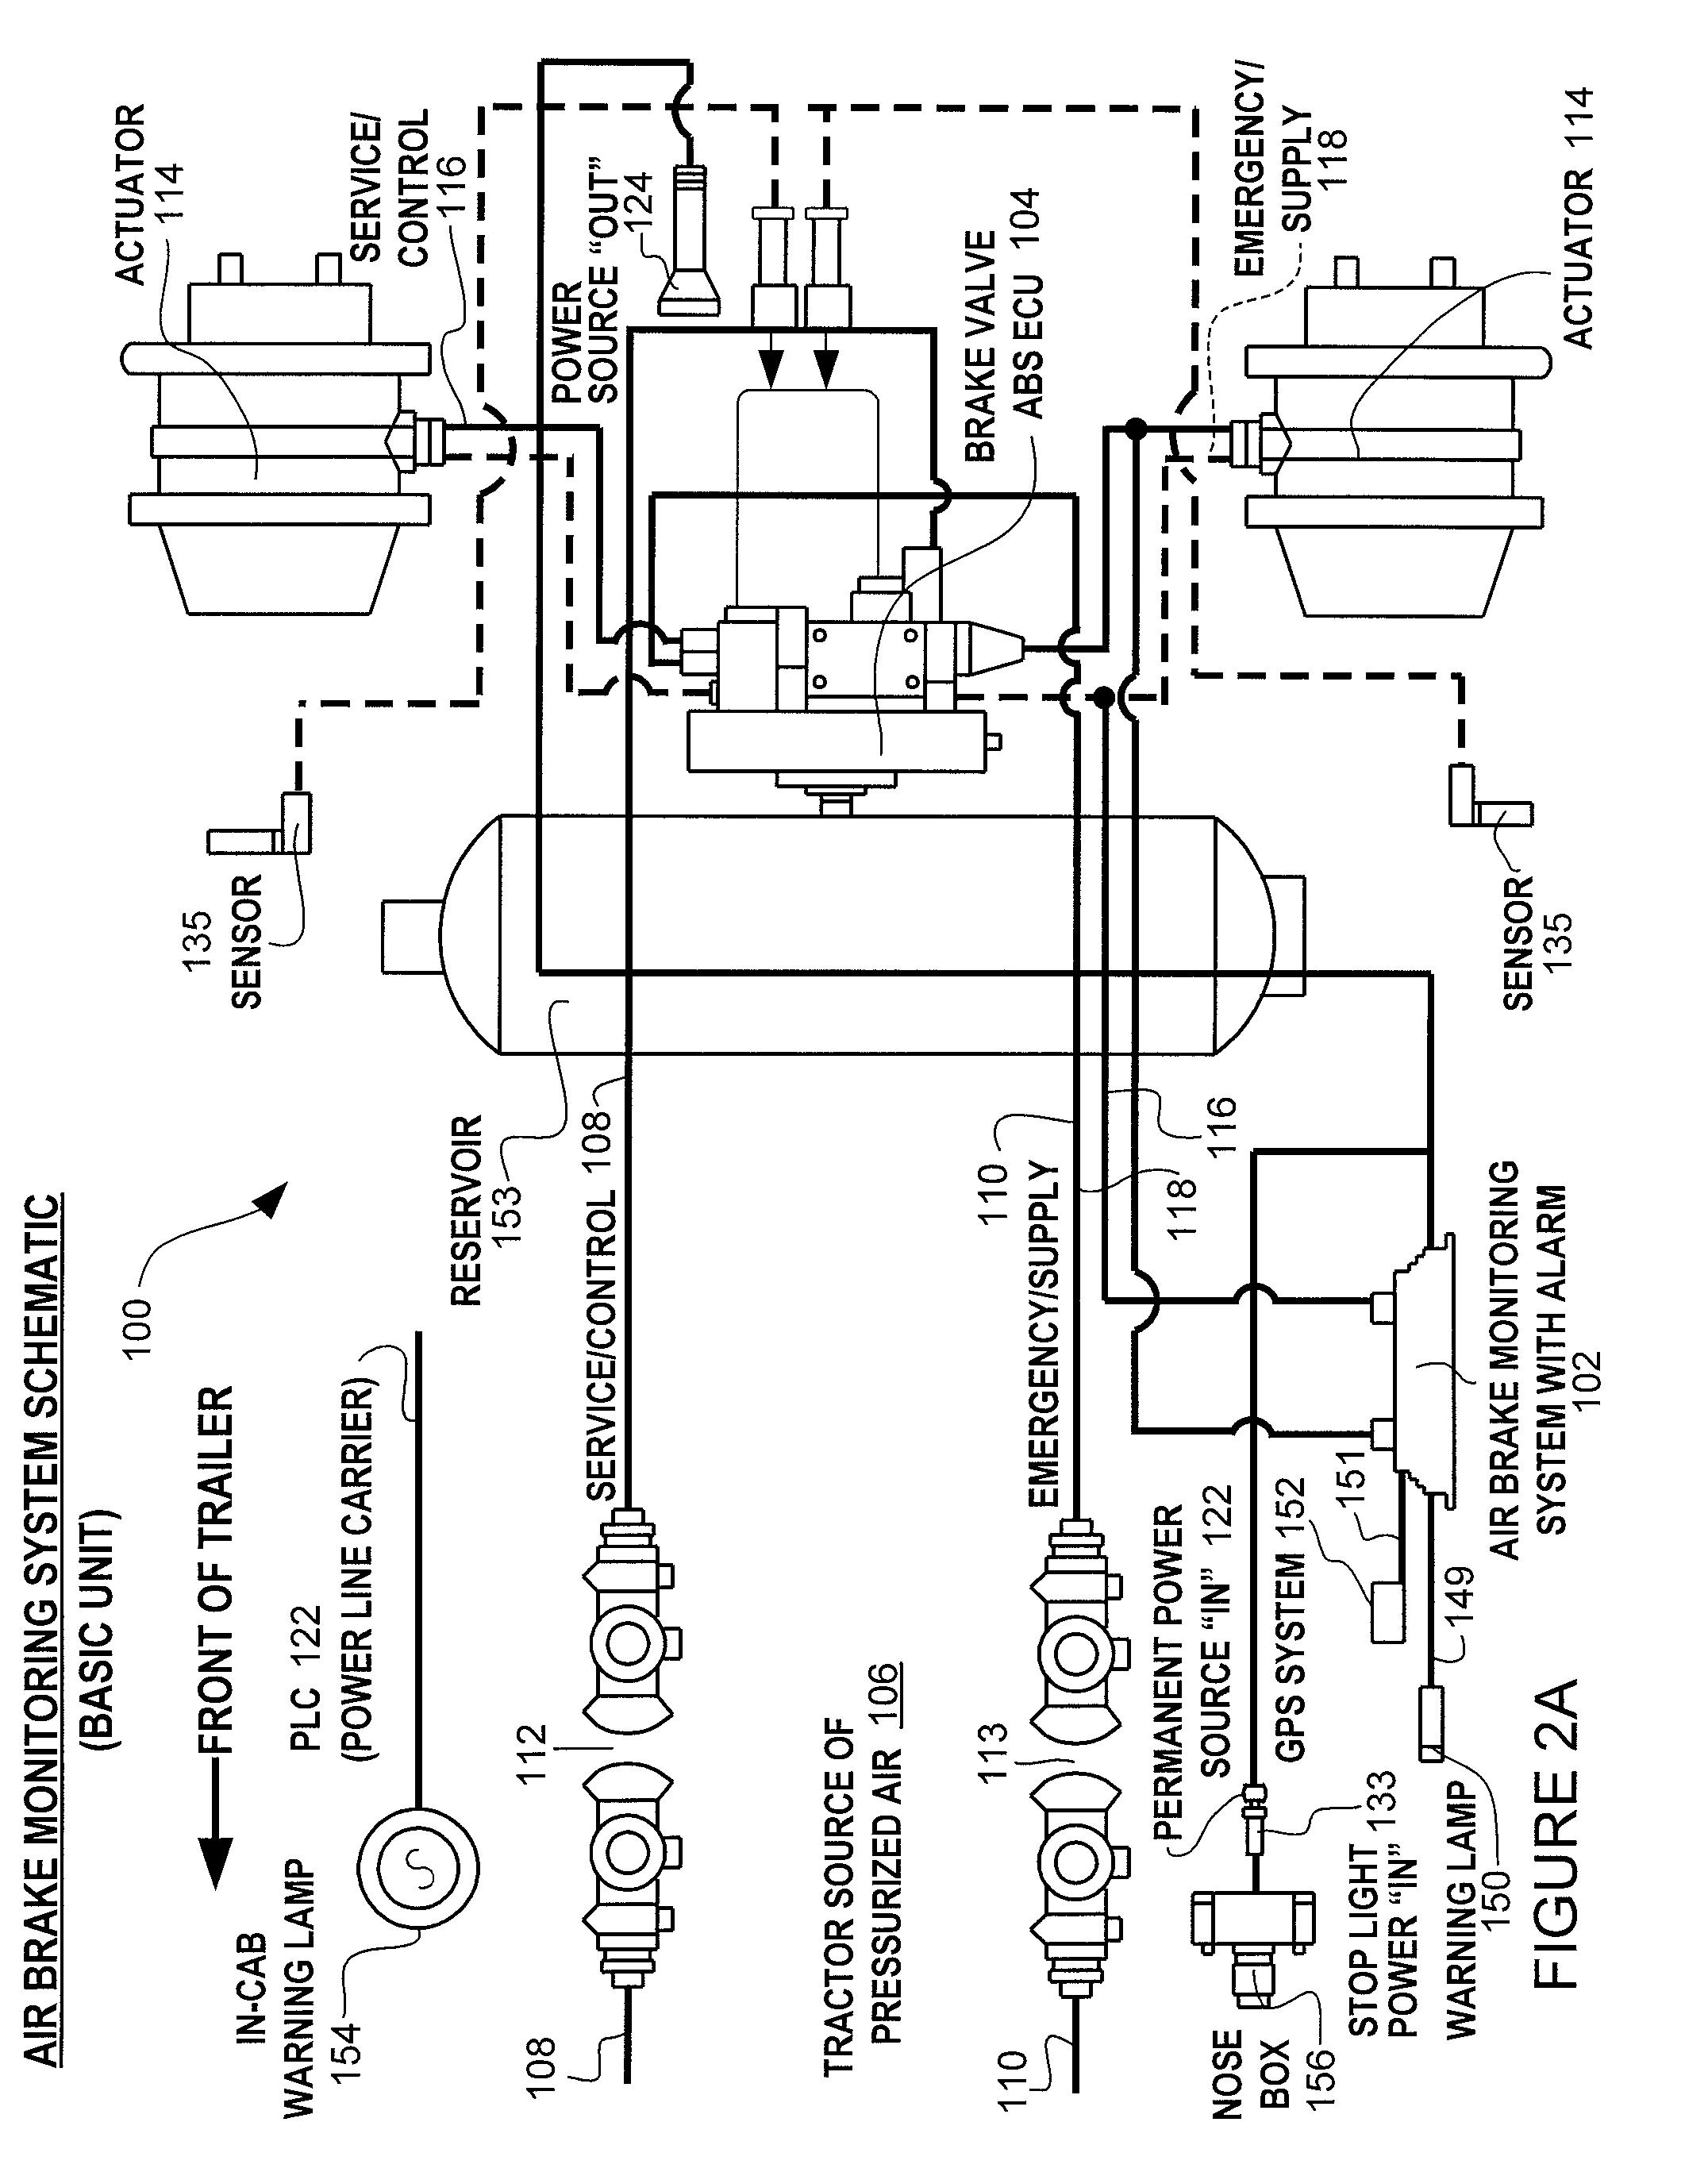 US08204668 20120619 D00003?resize\\\\=665%2C845\\\\&ssl\\\\=1 1997 peterbilt 378 wiring schematic wiring diagram 1990 peterbilt 378 wiring schematic at crackthecode.co